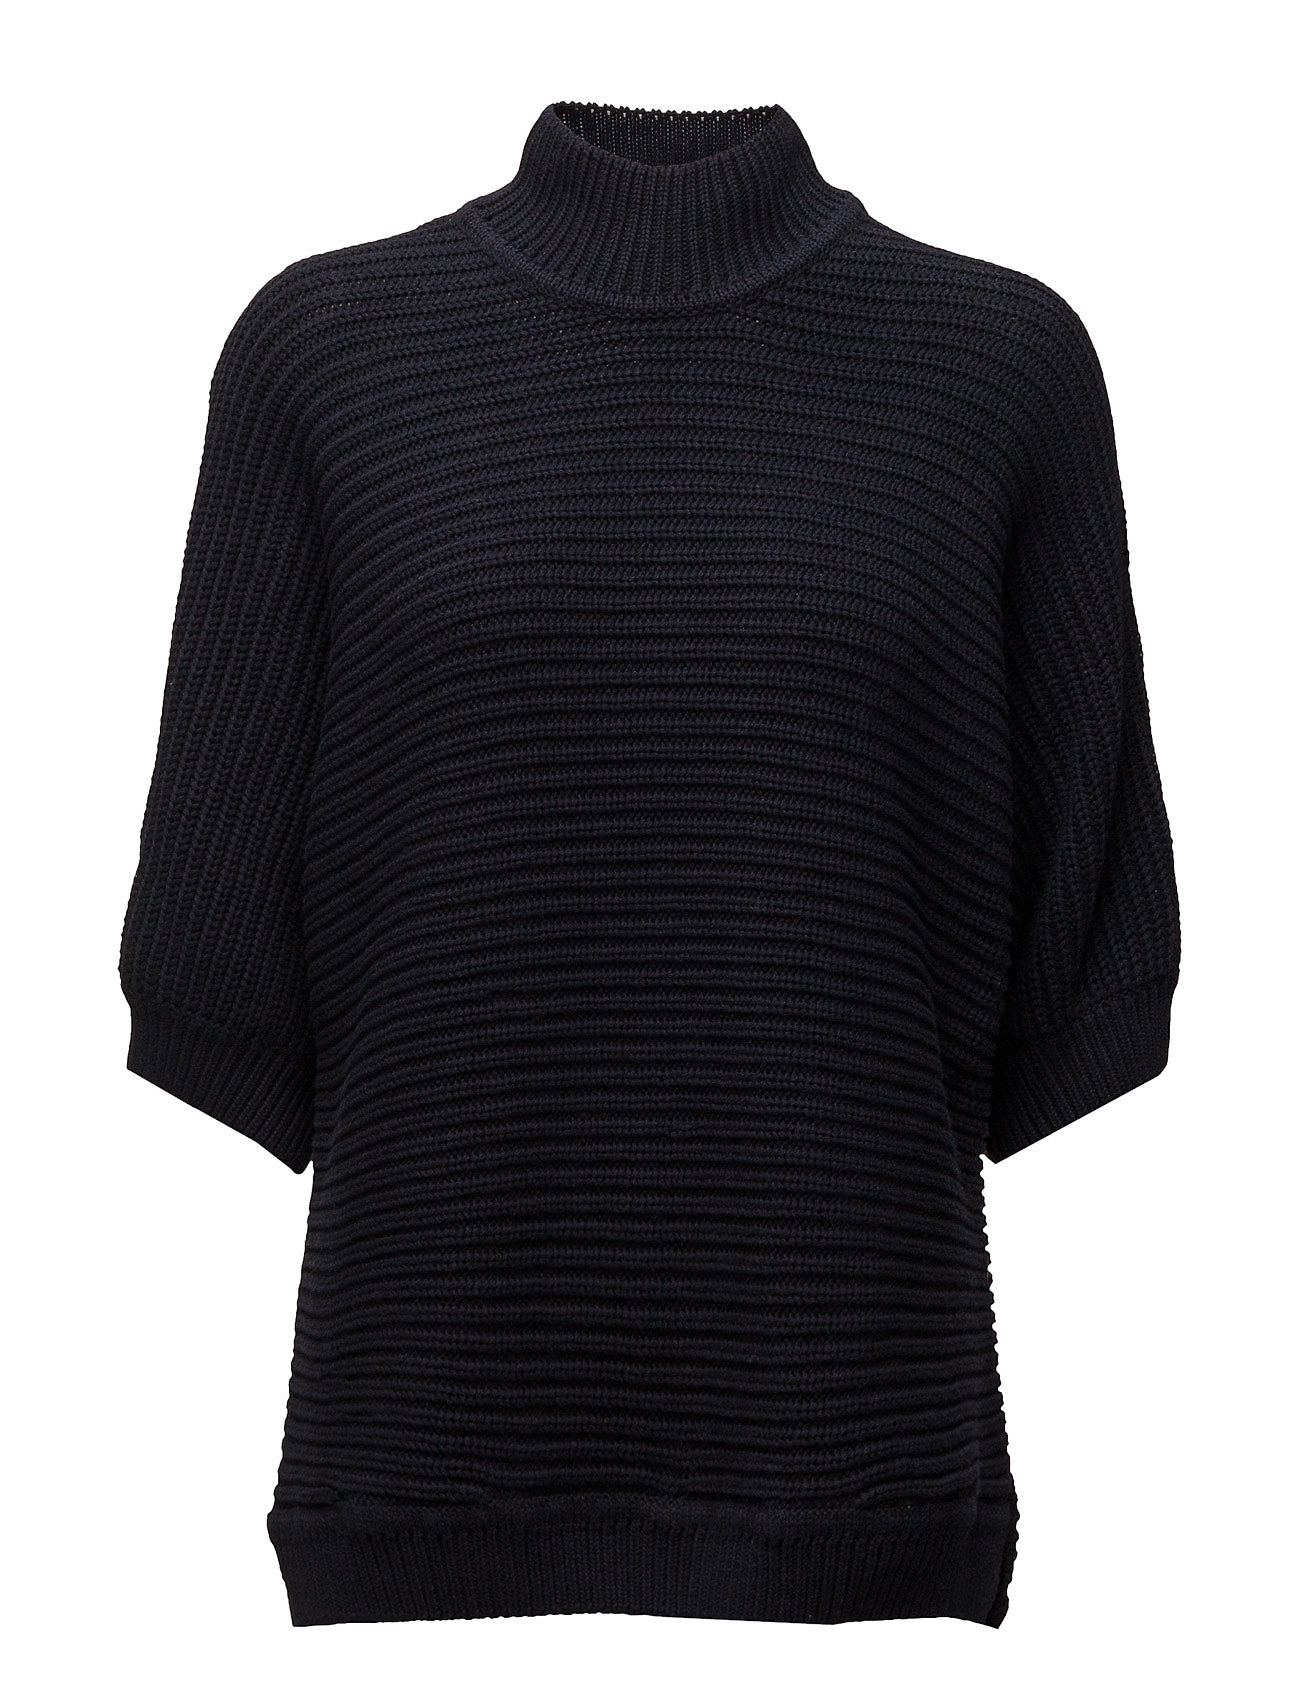 Lille Knit Hunkydory Sweatshirts til Damer i Midnight Navy